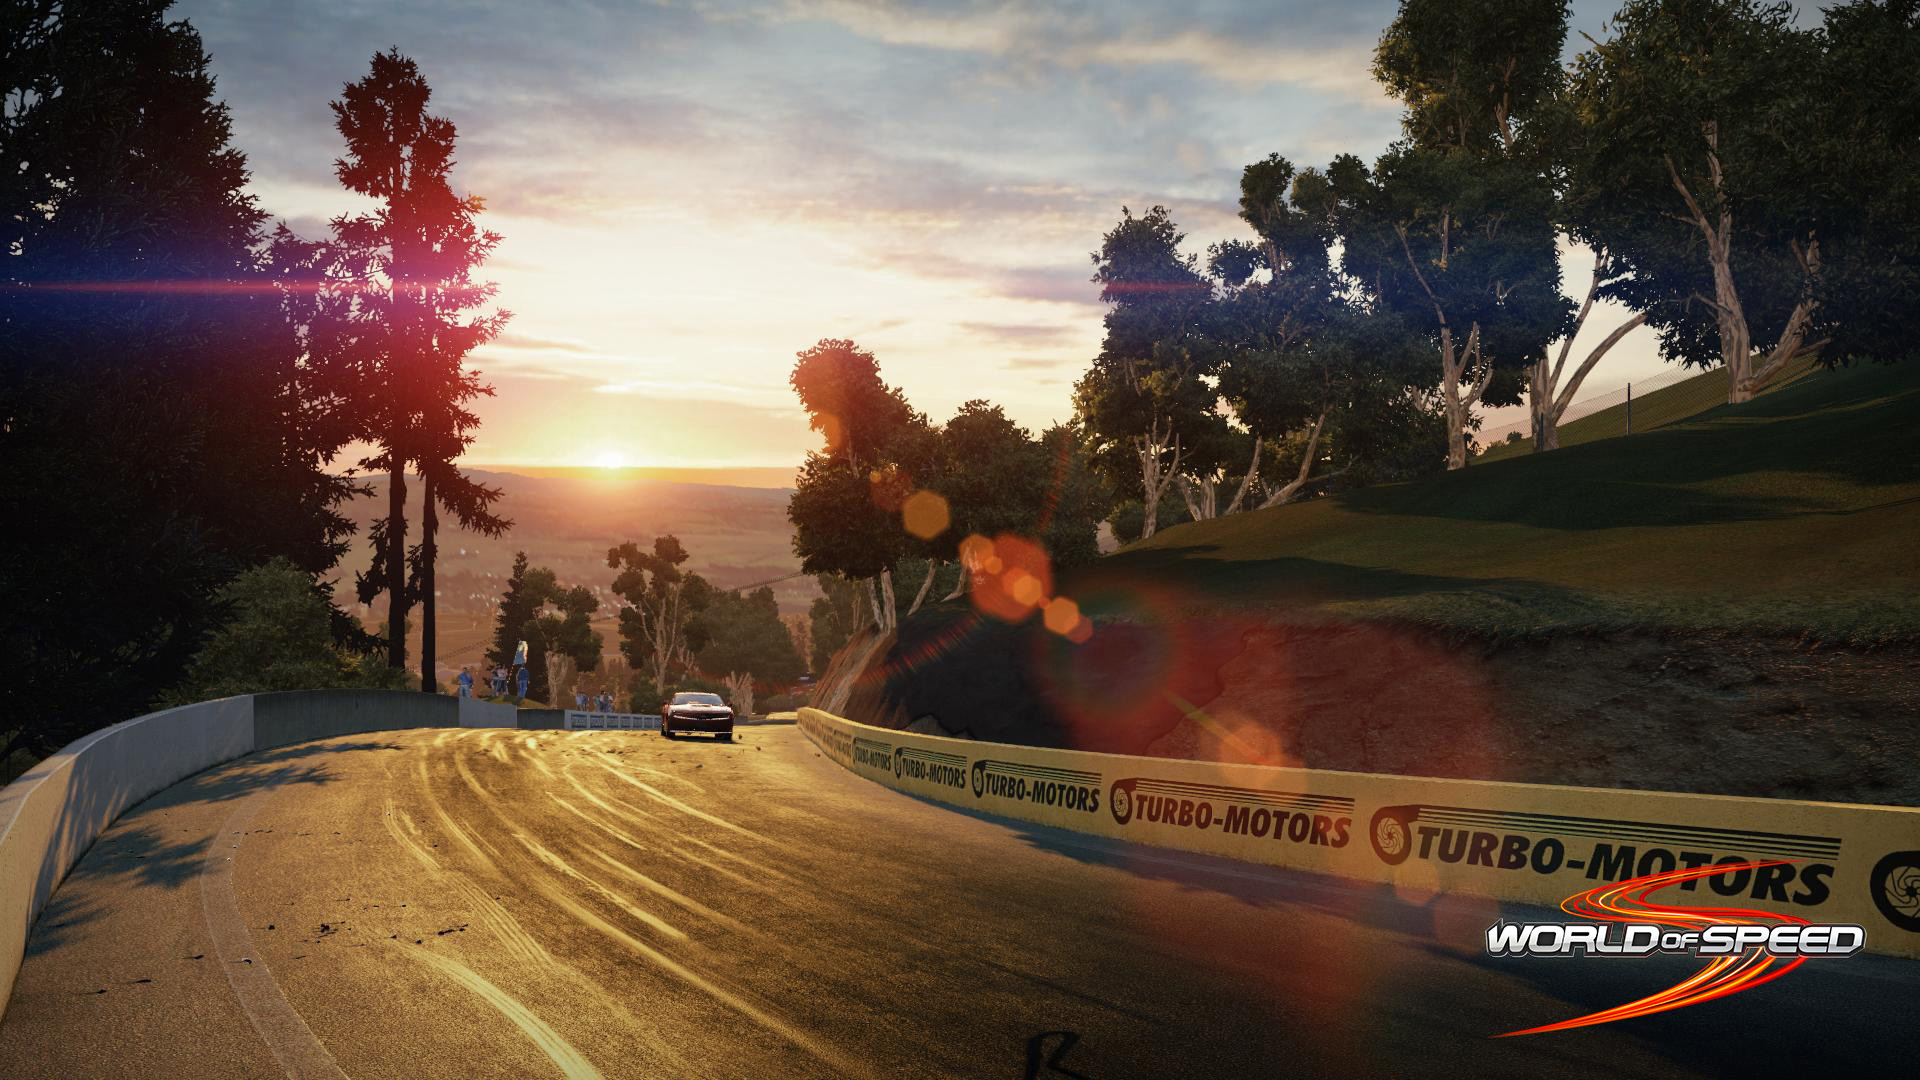 Ngắm trường đua Bathurst trong World of Speed